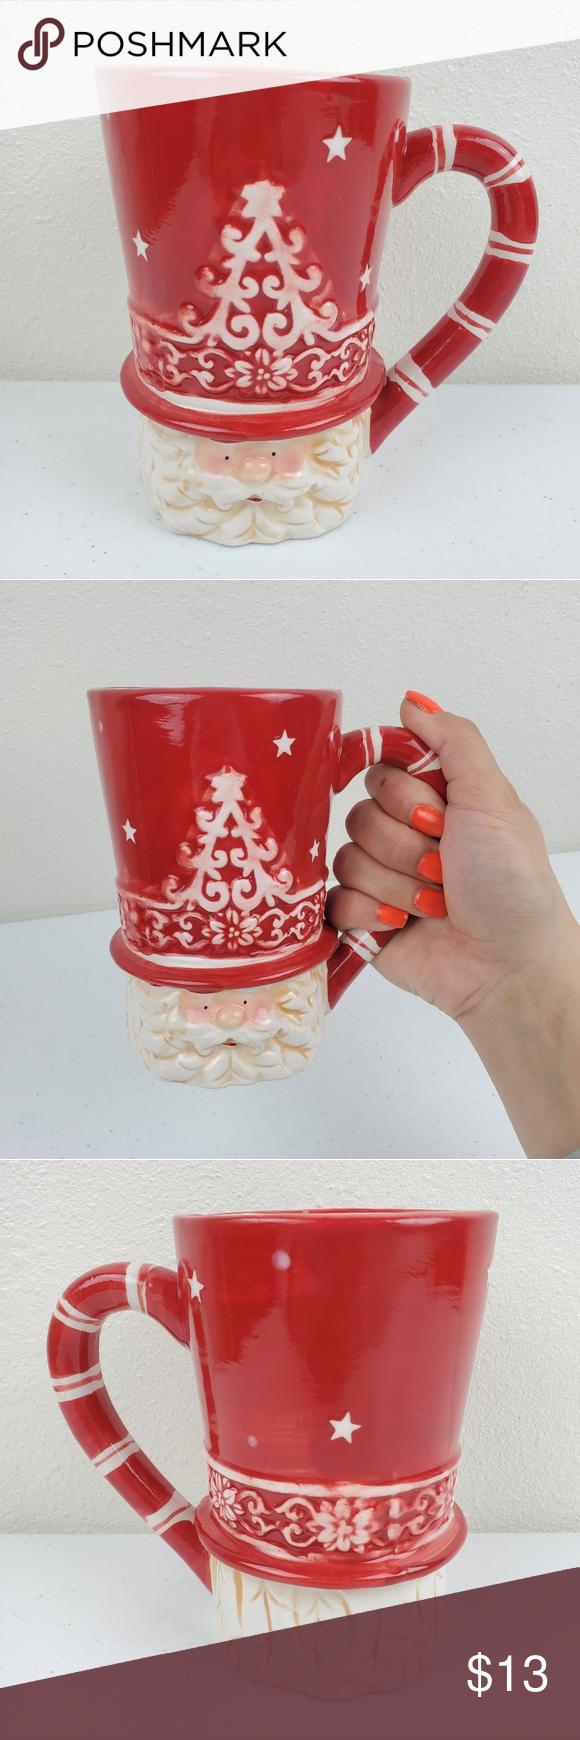 Christmas Santa Clause Large Holiday Coffee Mug Preowned